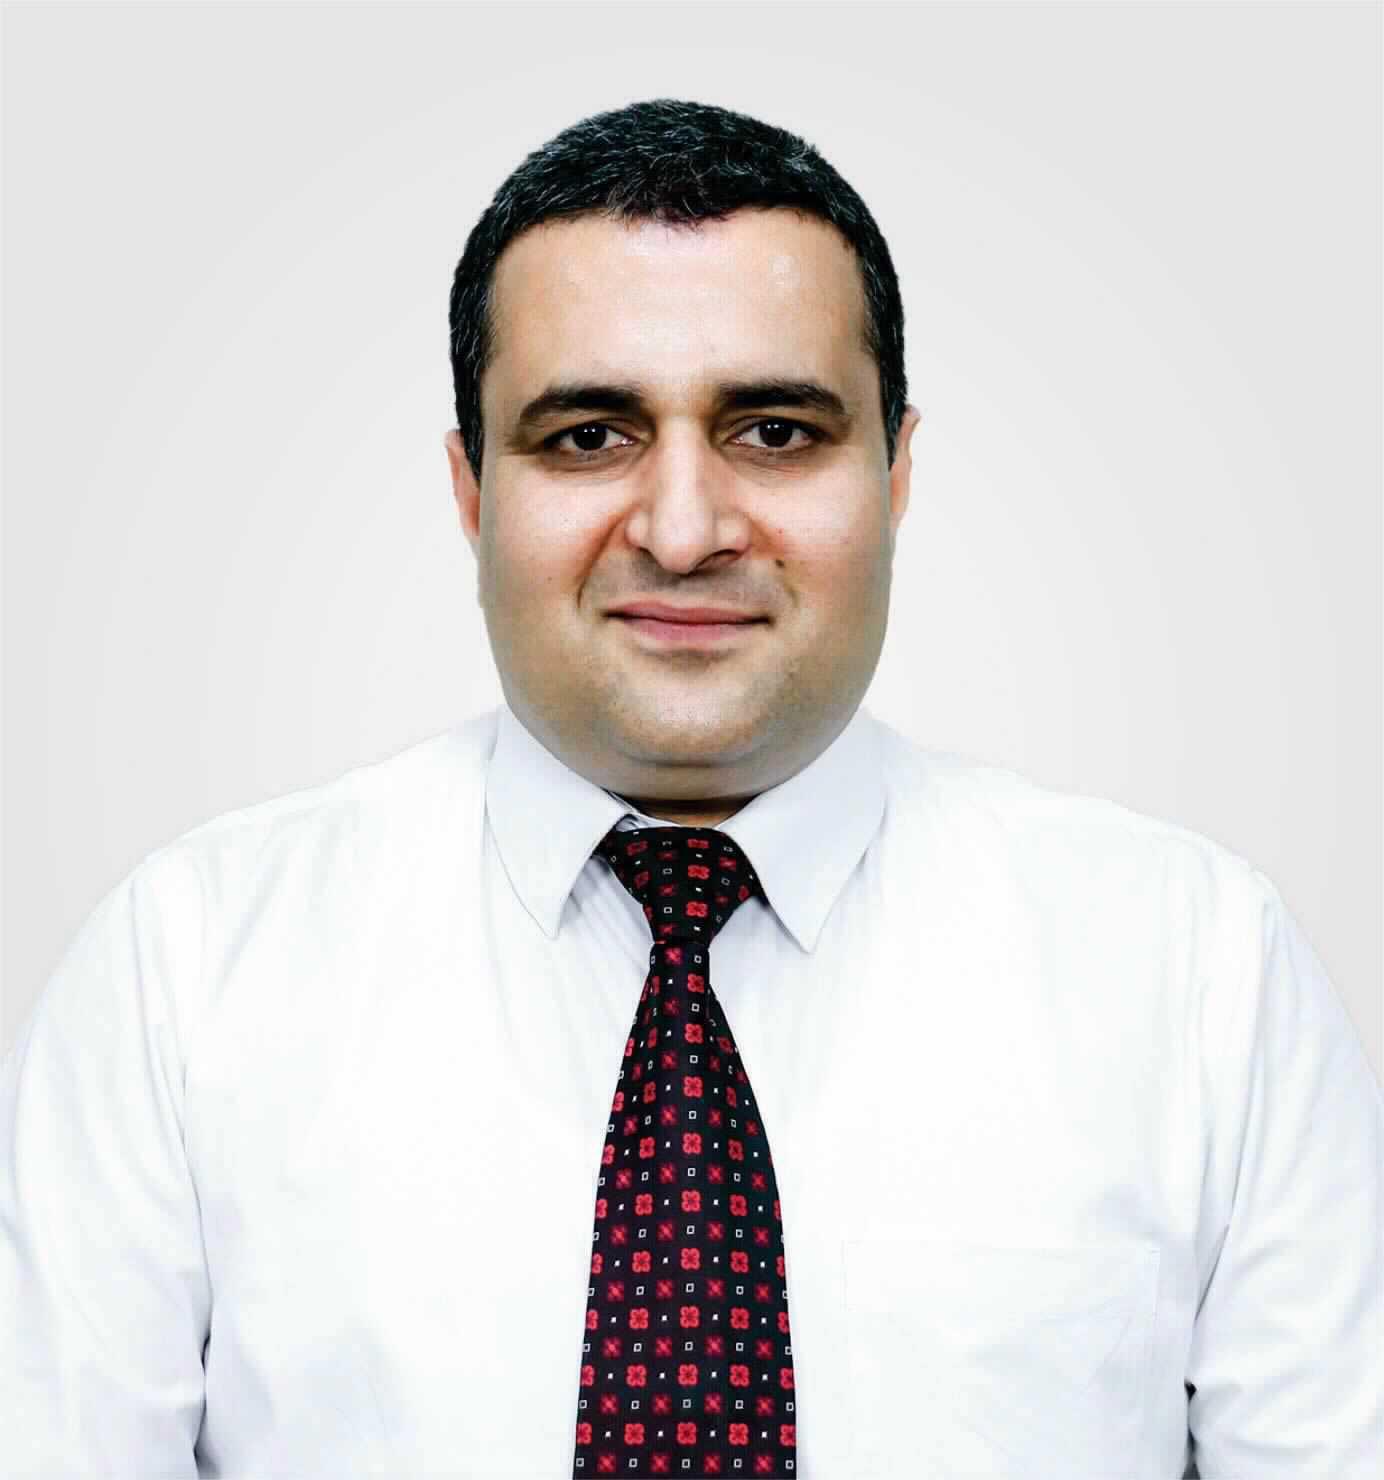 Qamar Hafeez Kiani